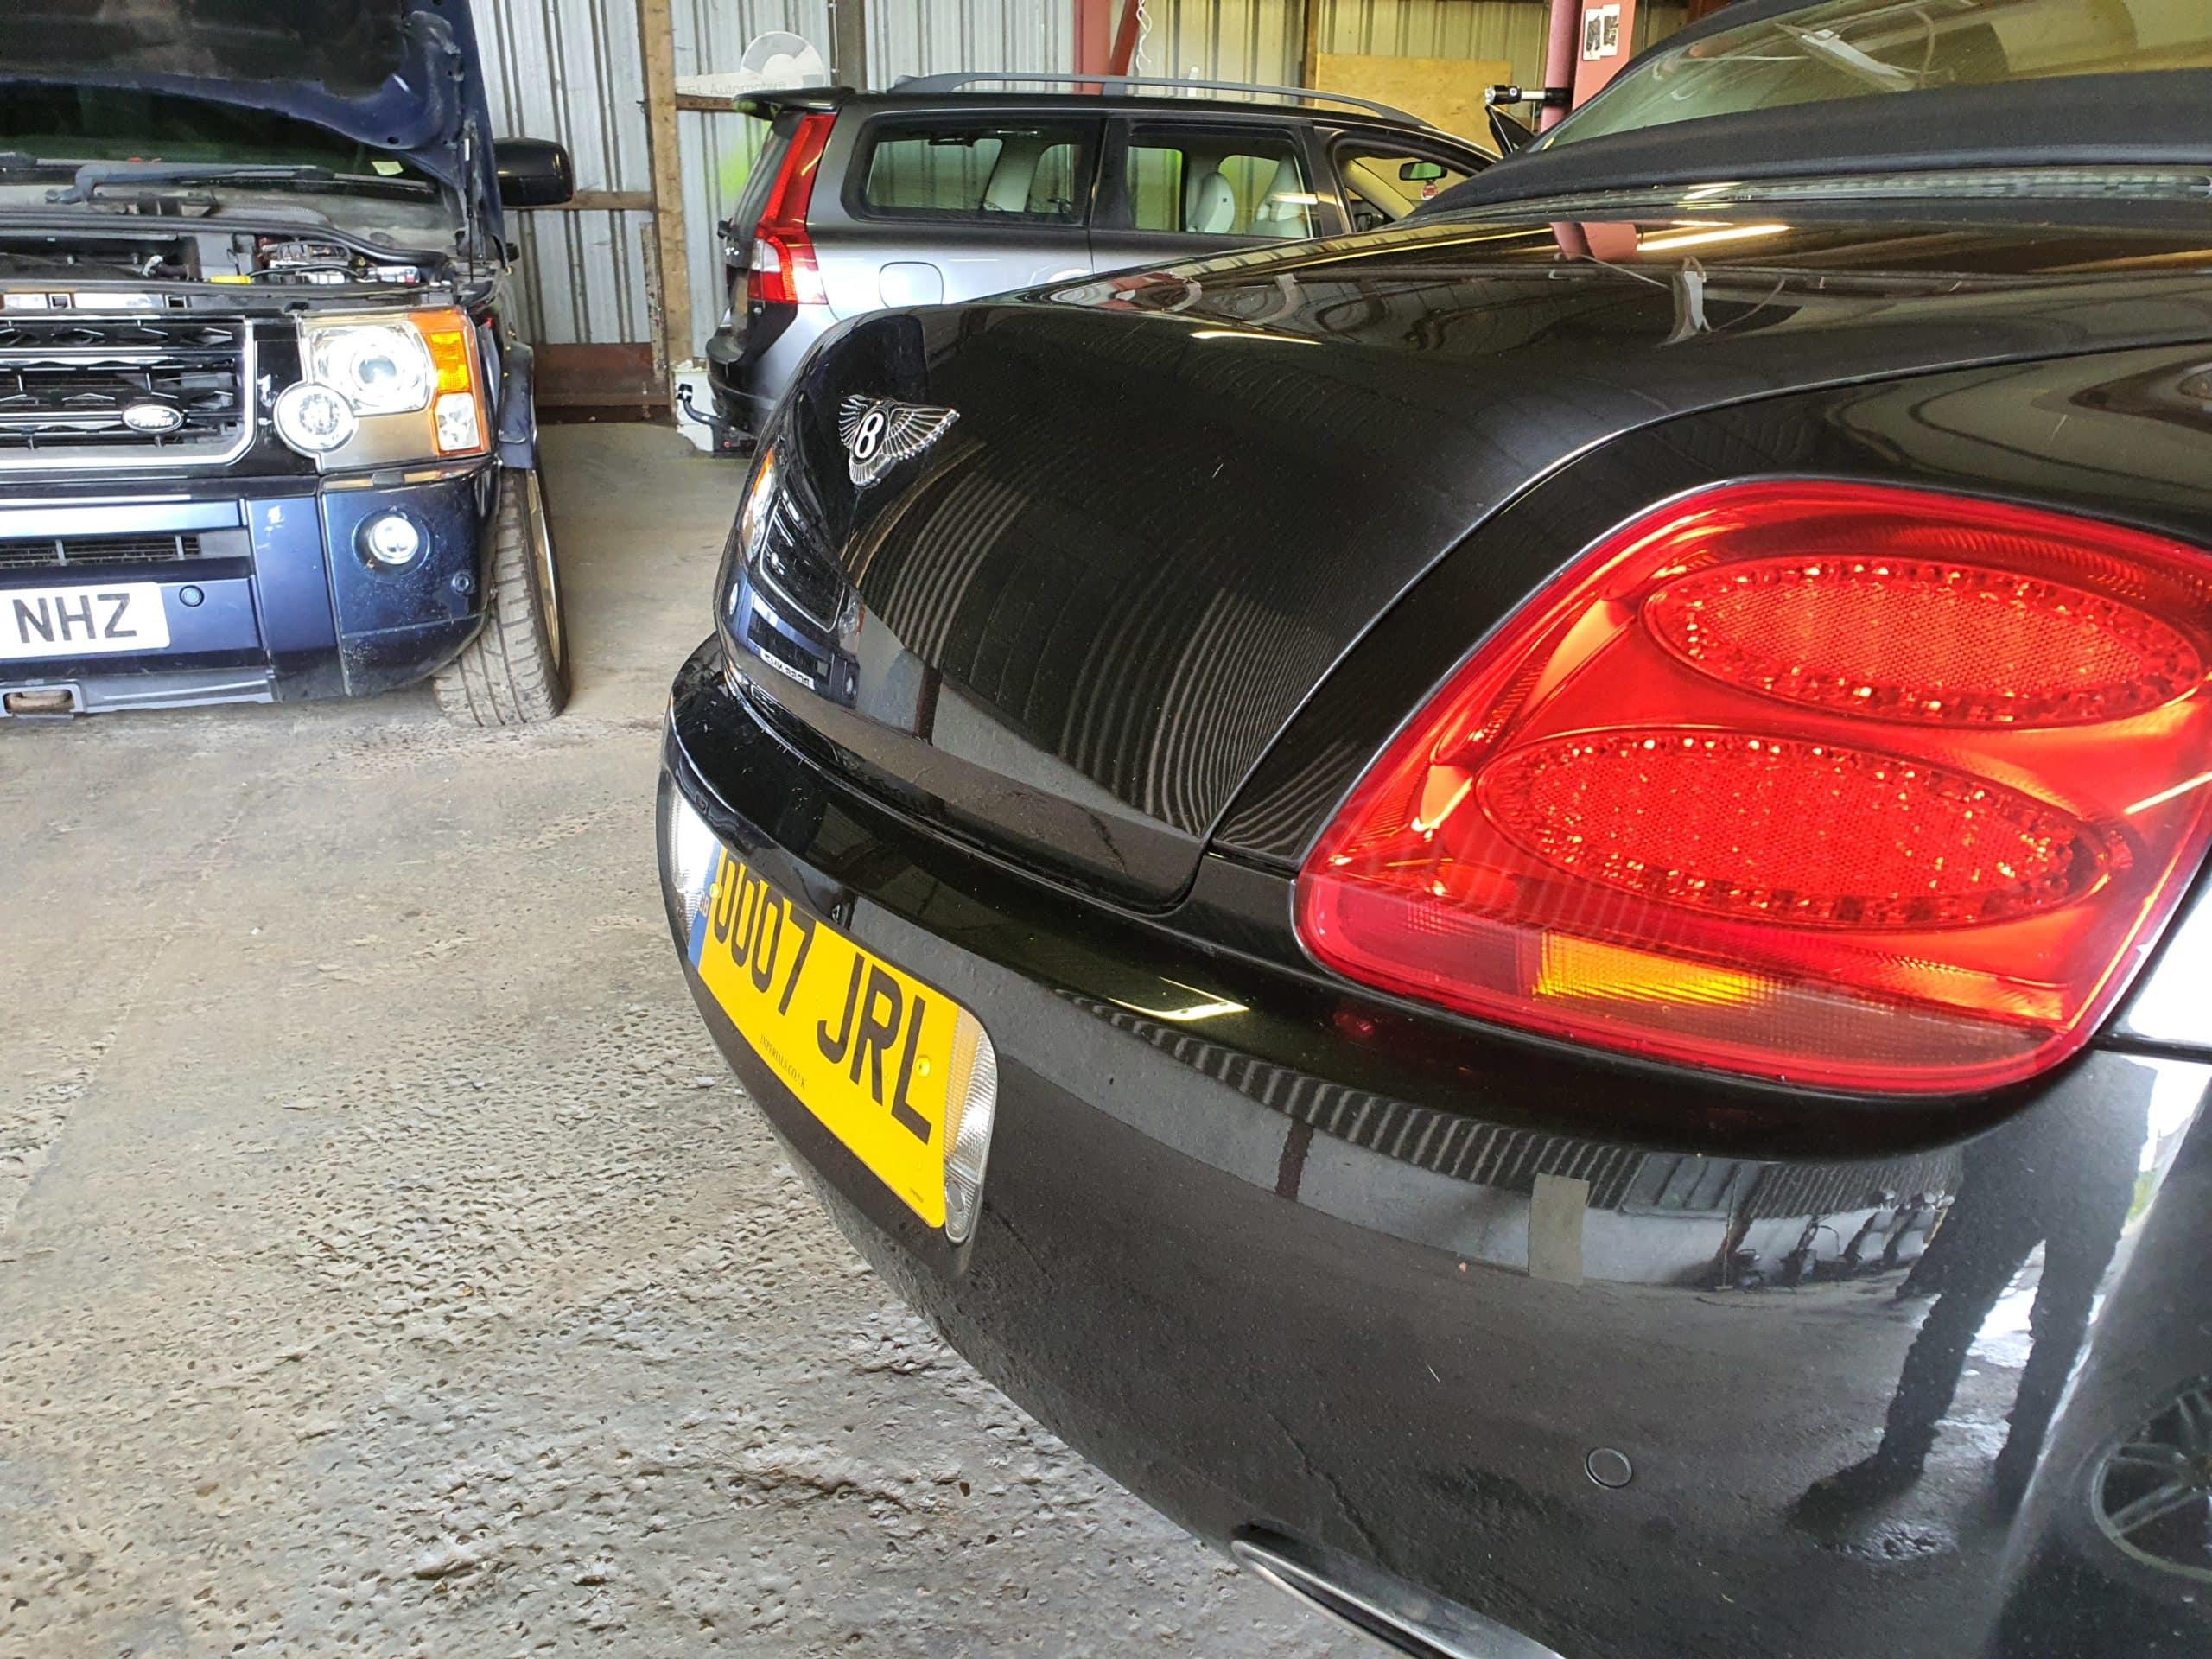 Bentley Exhaust flapper Modification